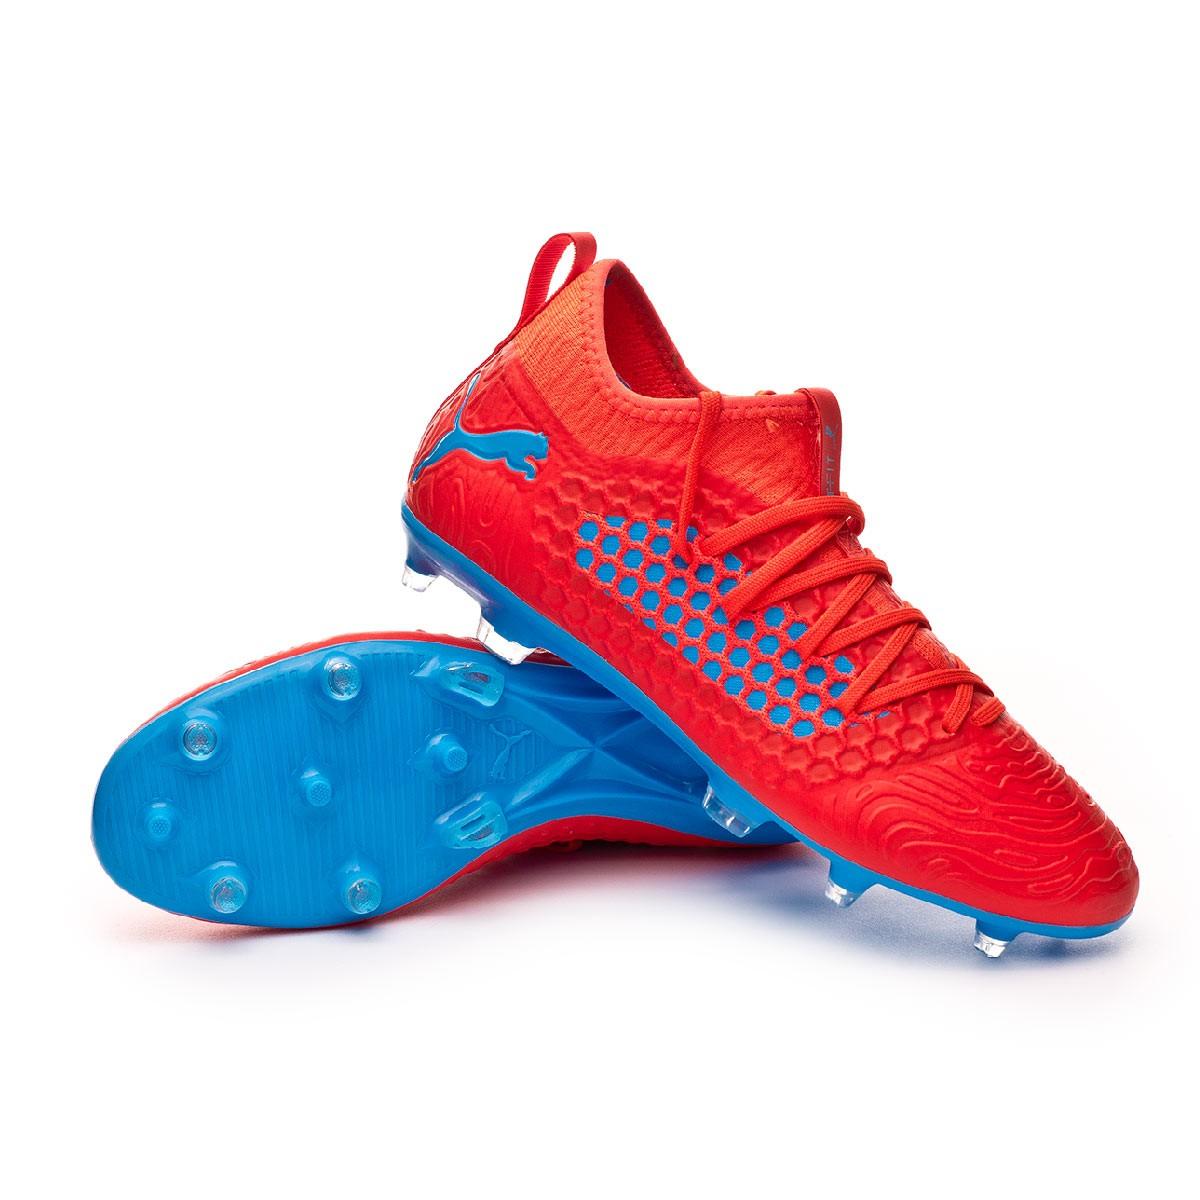 2b73d1d21 Zapatos de fútbol Puma Future 19.3 Netfit FG/AG Red blast-Bleu azur -  Tienda de fútbol Fútbol Emotion